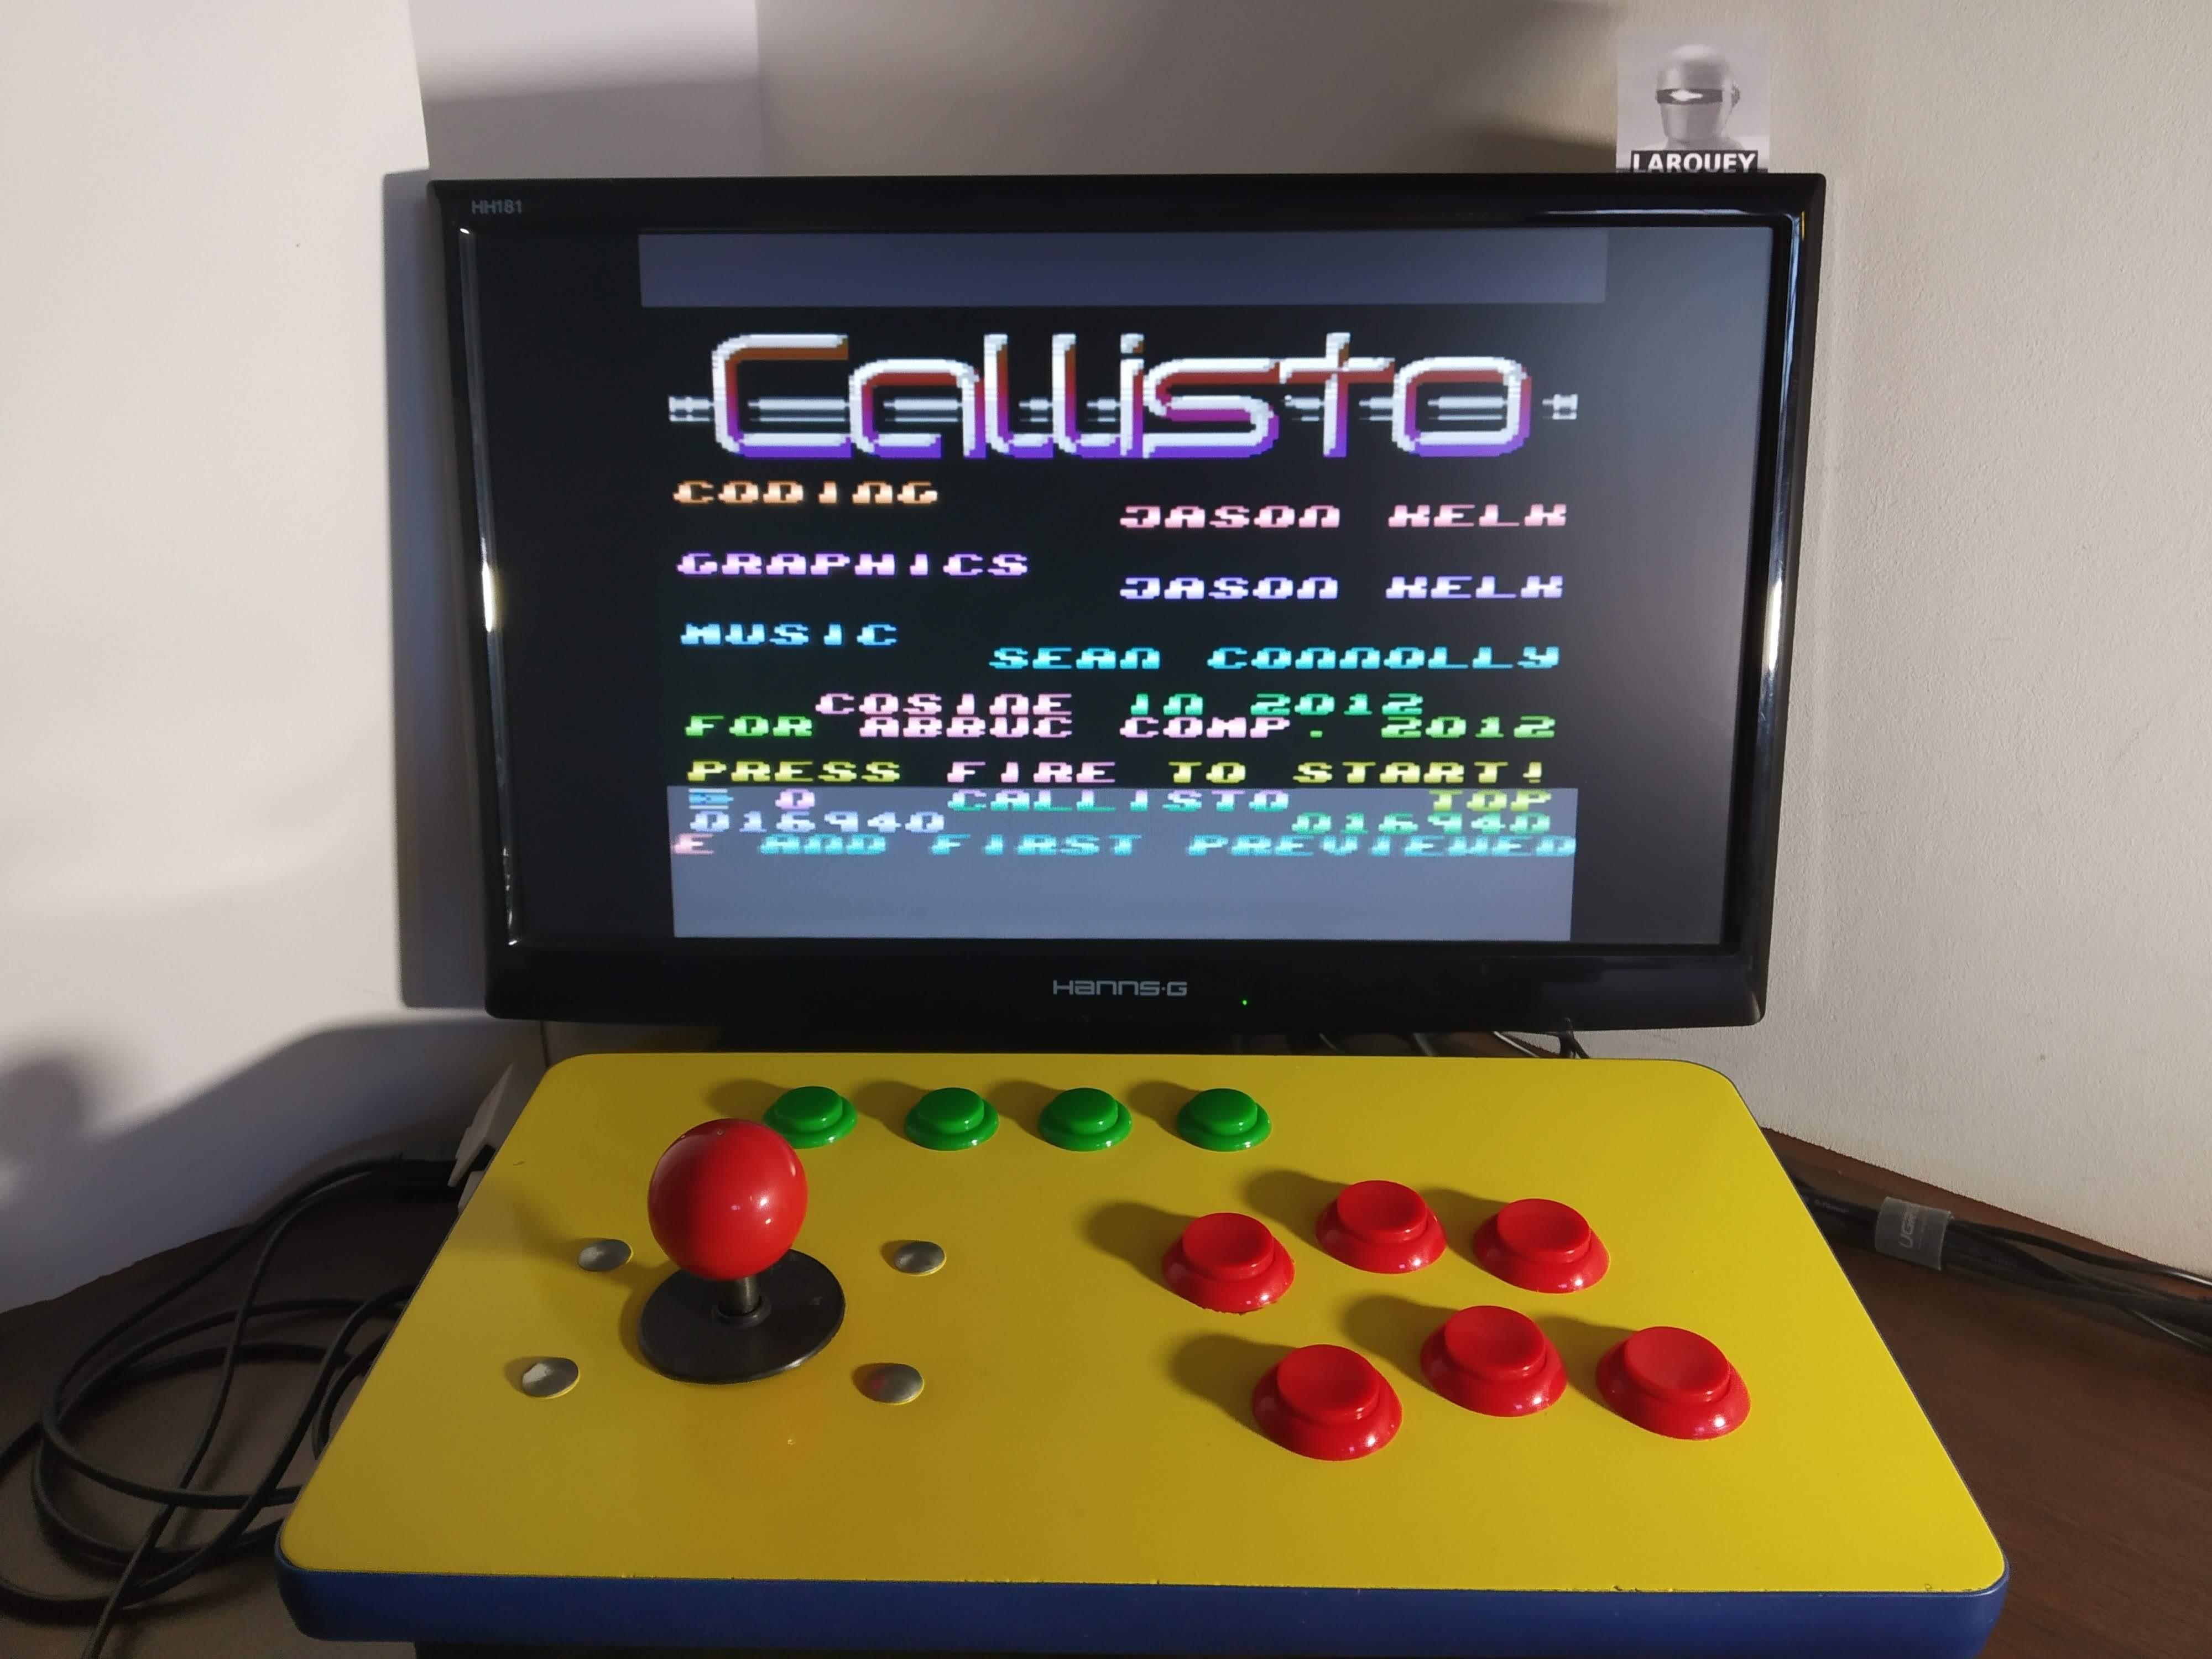 Larquey: Callisto (Atari 400/800/XL/XE Emulated) 16,940 points on 2020-01-01 09:21:42